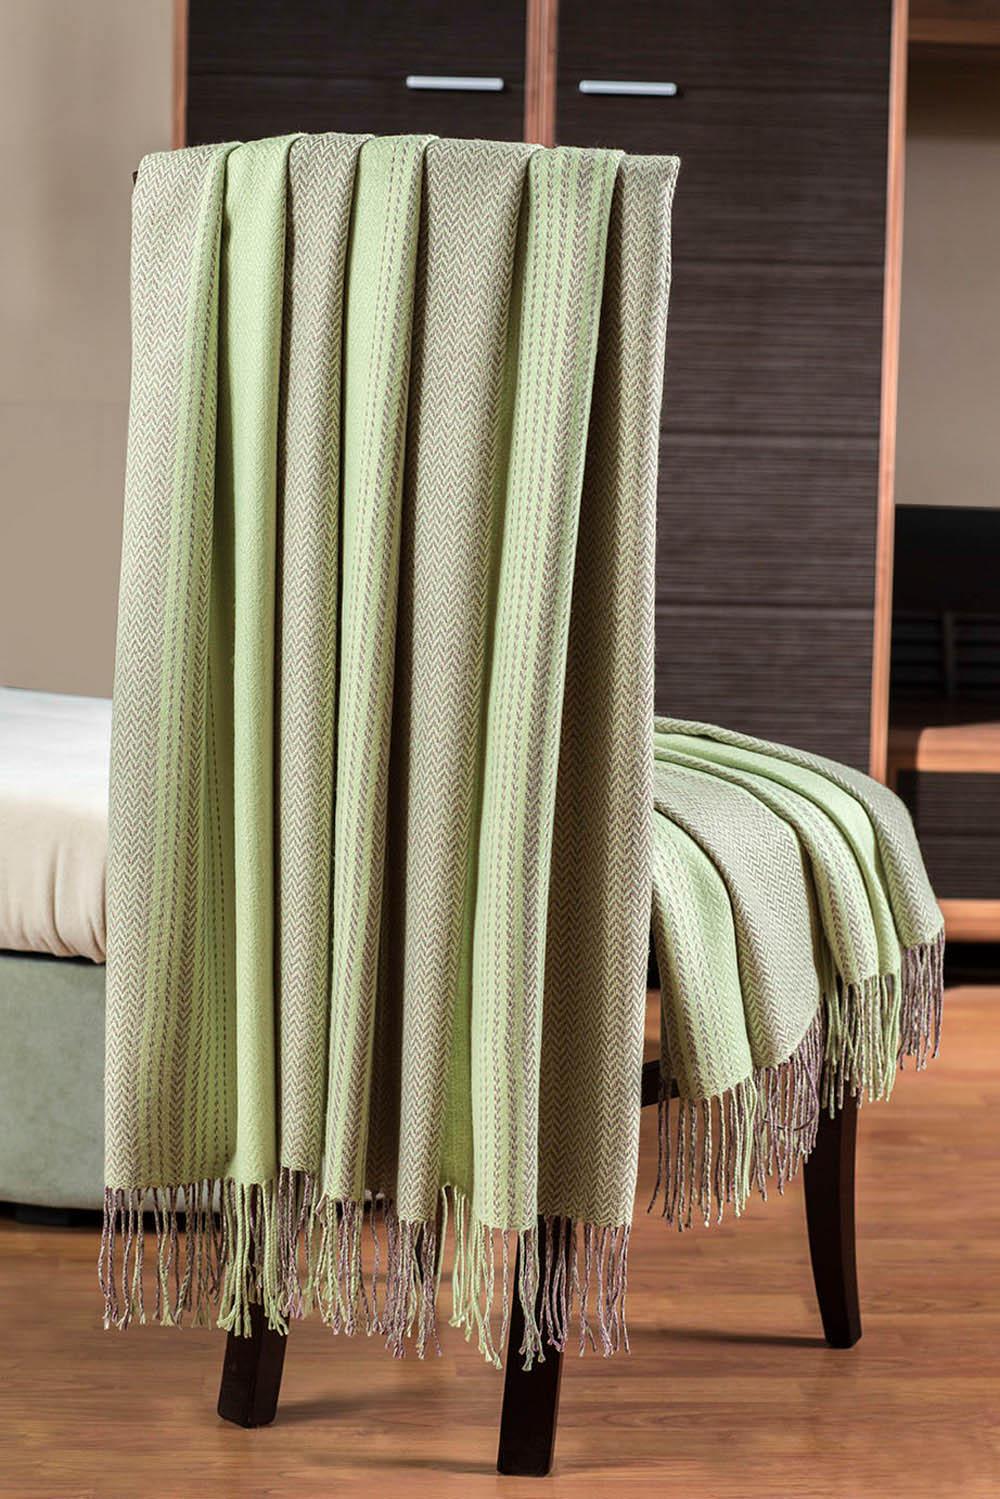 Плед Primavelle Плед Bamboo Цвет: Светло-Зеленый (140x180 см) primavelle bamboo